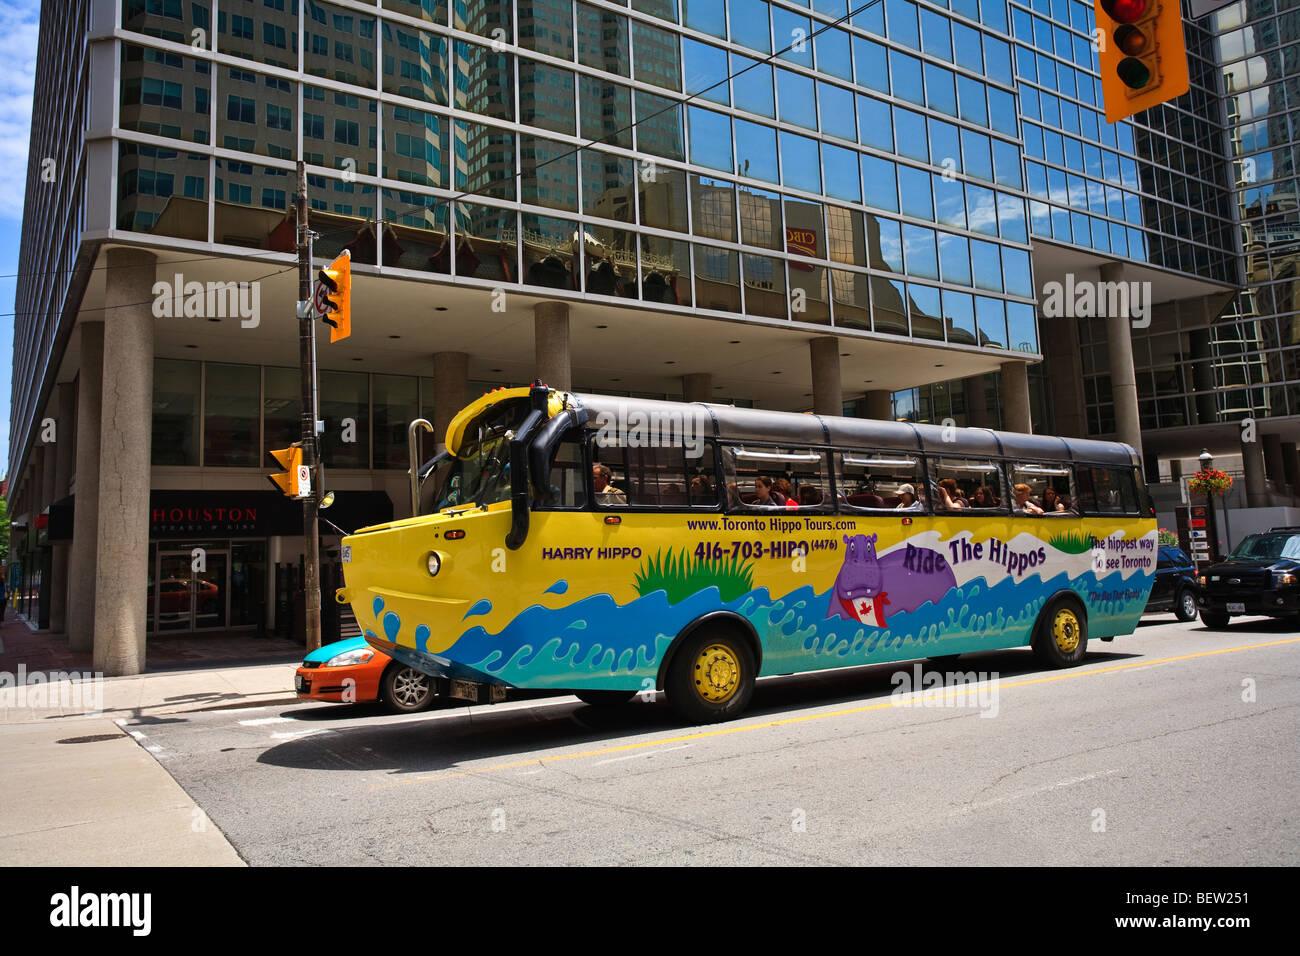 Toronto Hippo Tours bus - it's a bus, it's a boat! A Hippo is a unique 40 passenger vessel that offers land - Stock Image